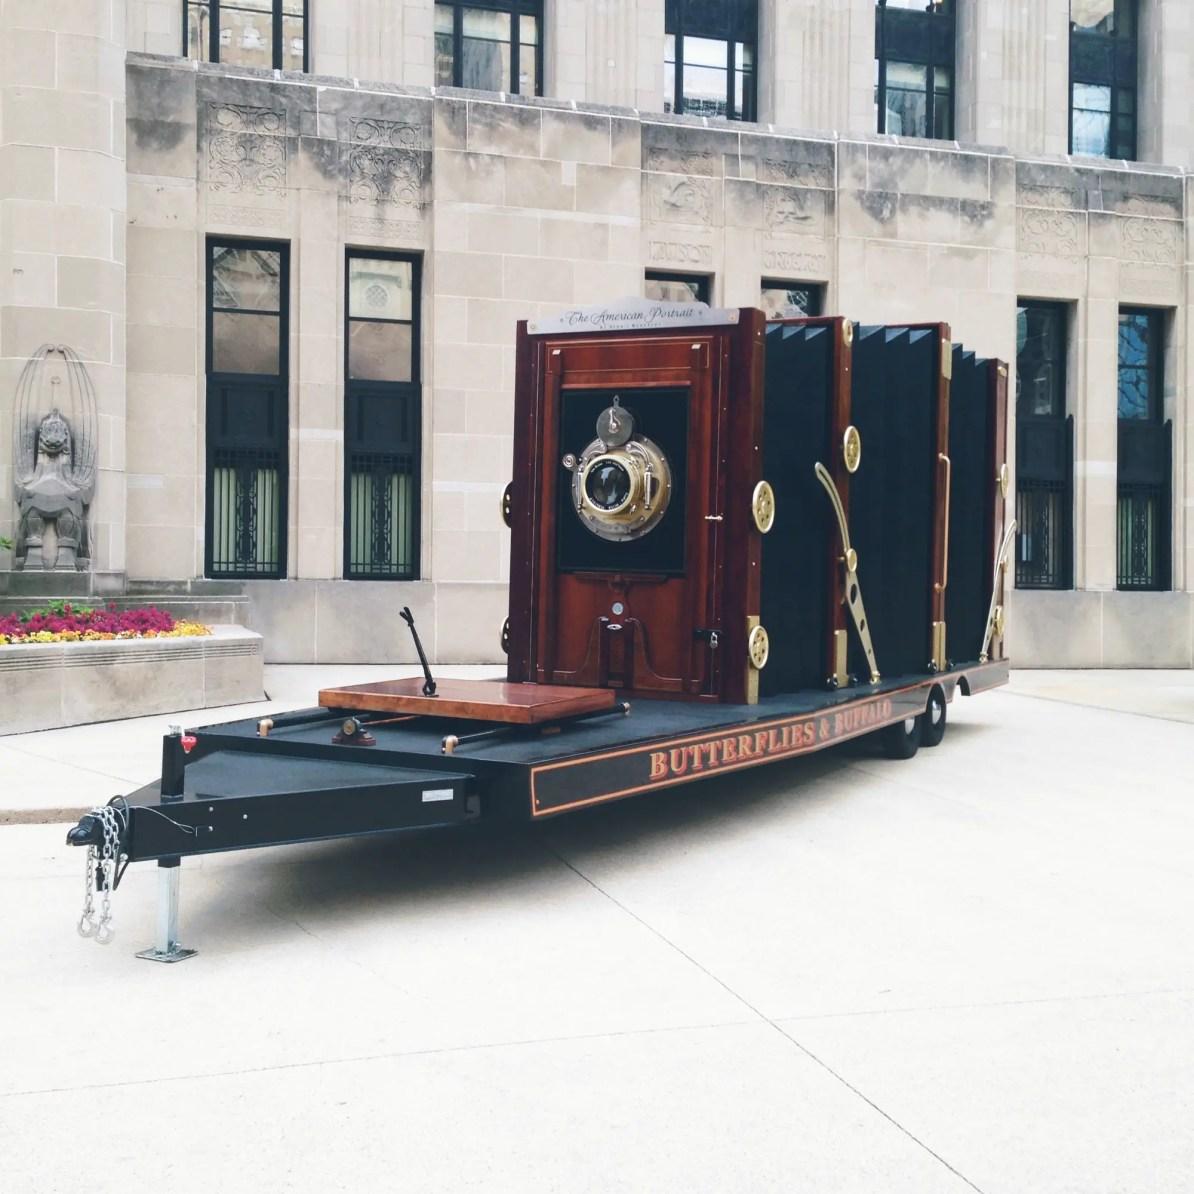 Dennis Manarchy's World's Largest Film Camera in Chicago